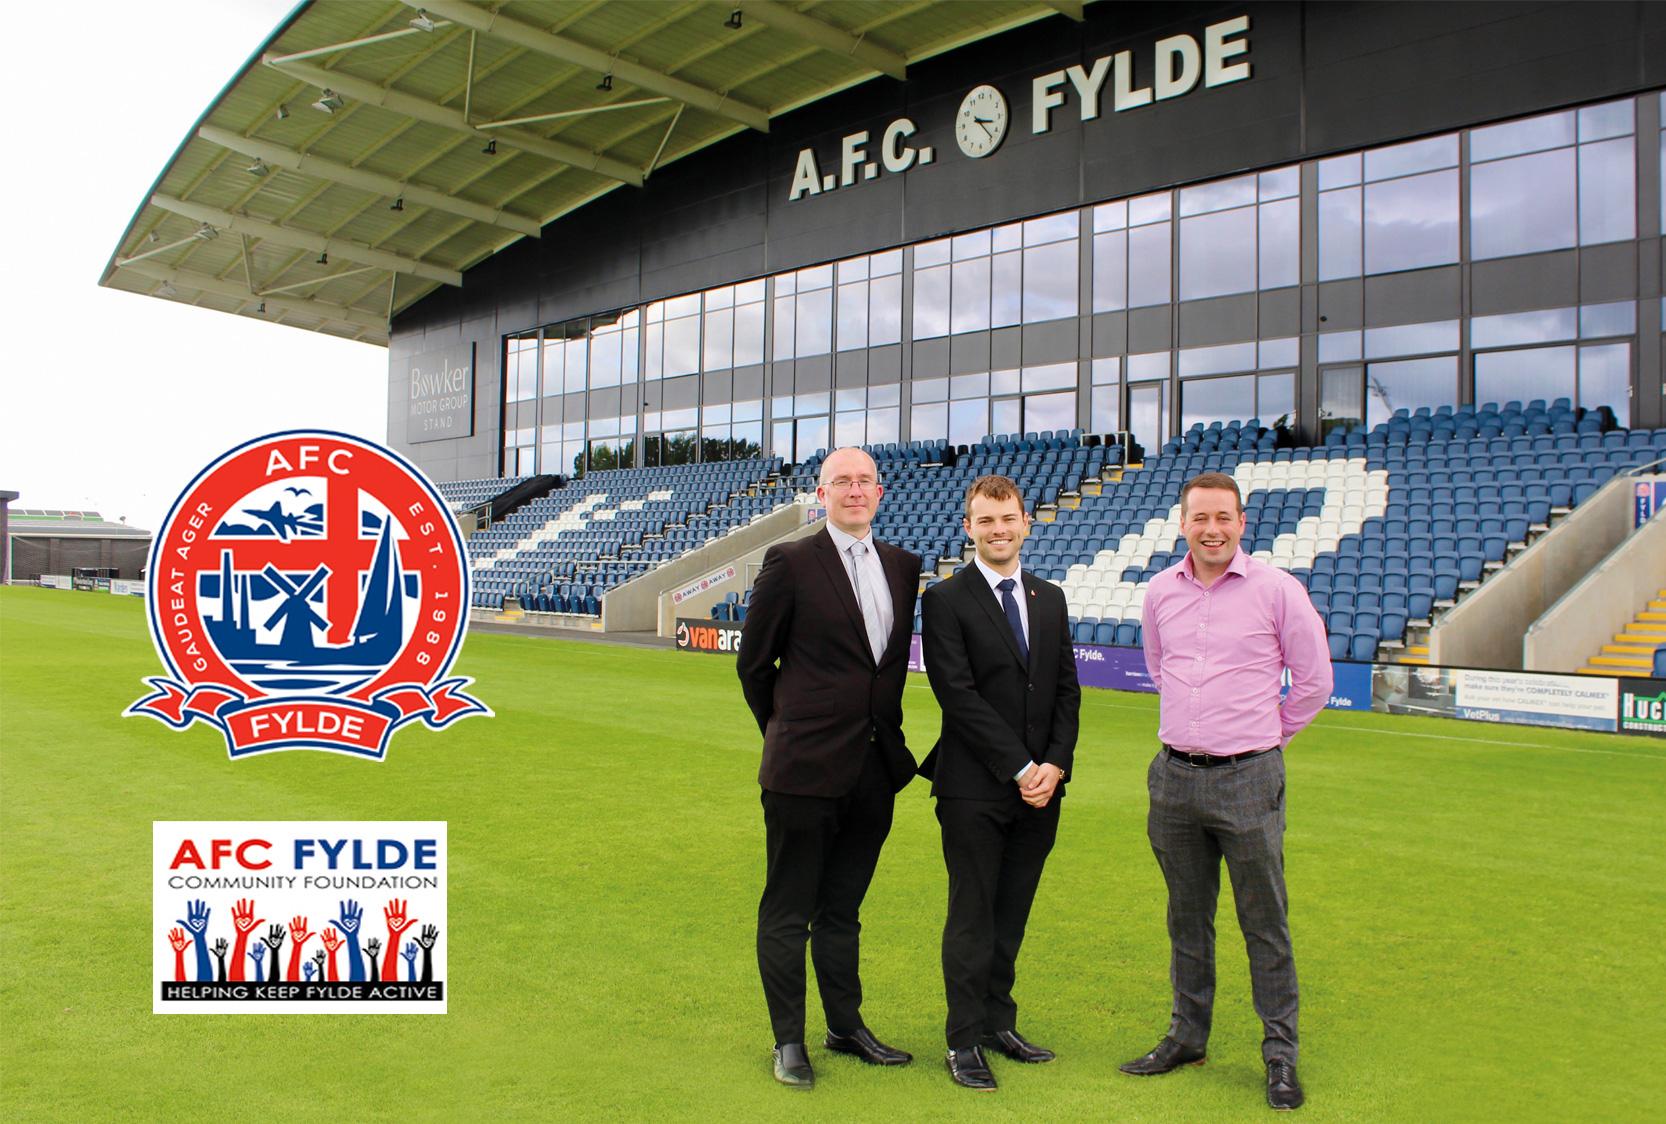 AFC Fylde Football ground